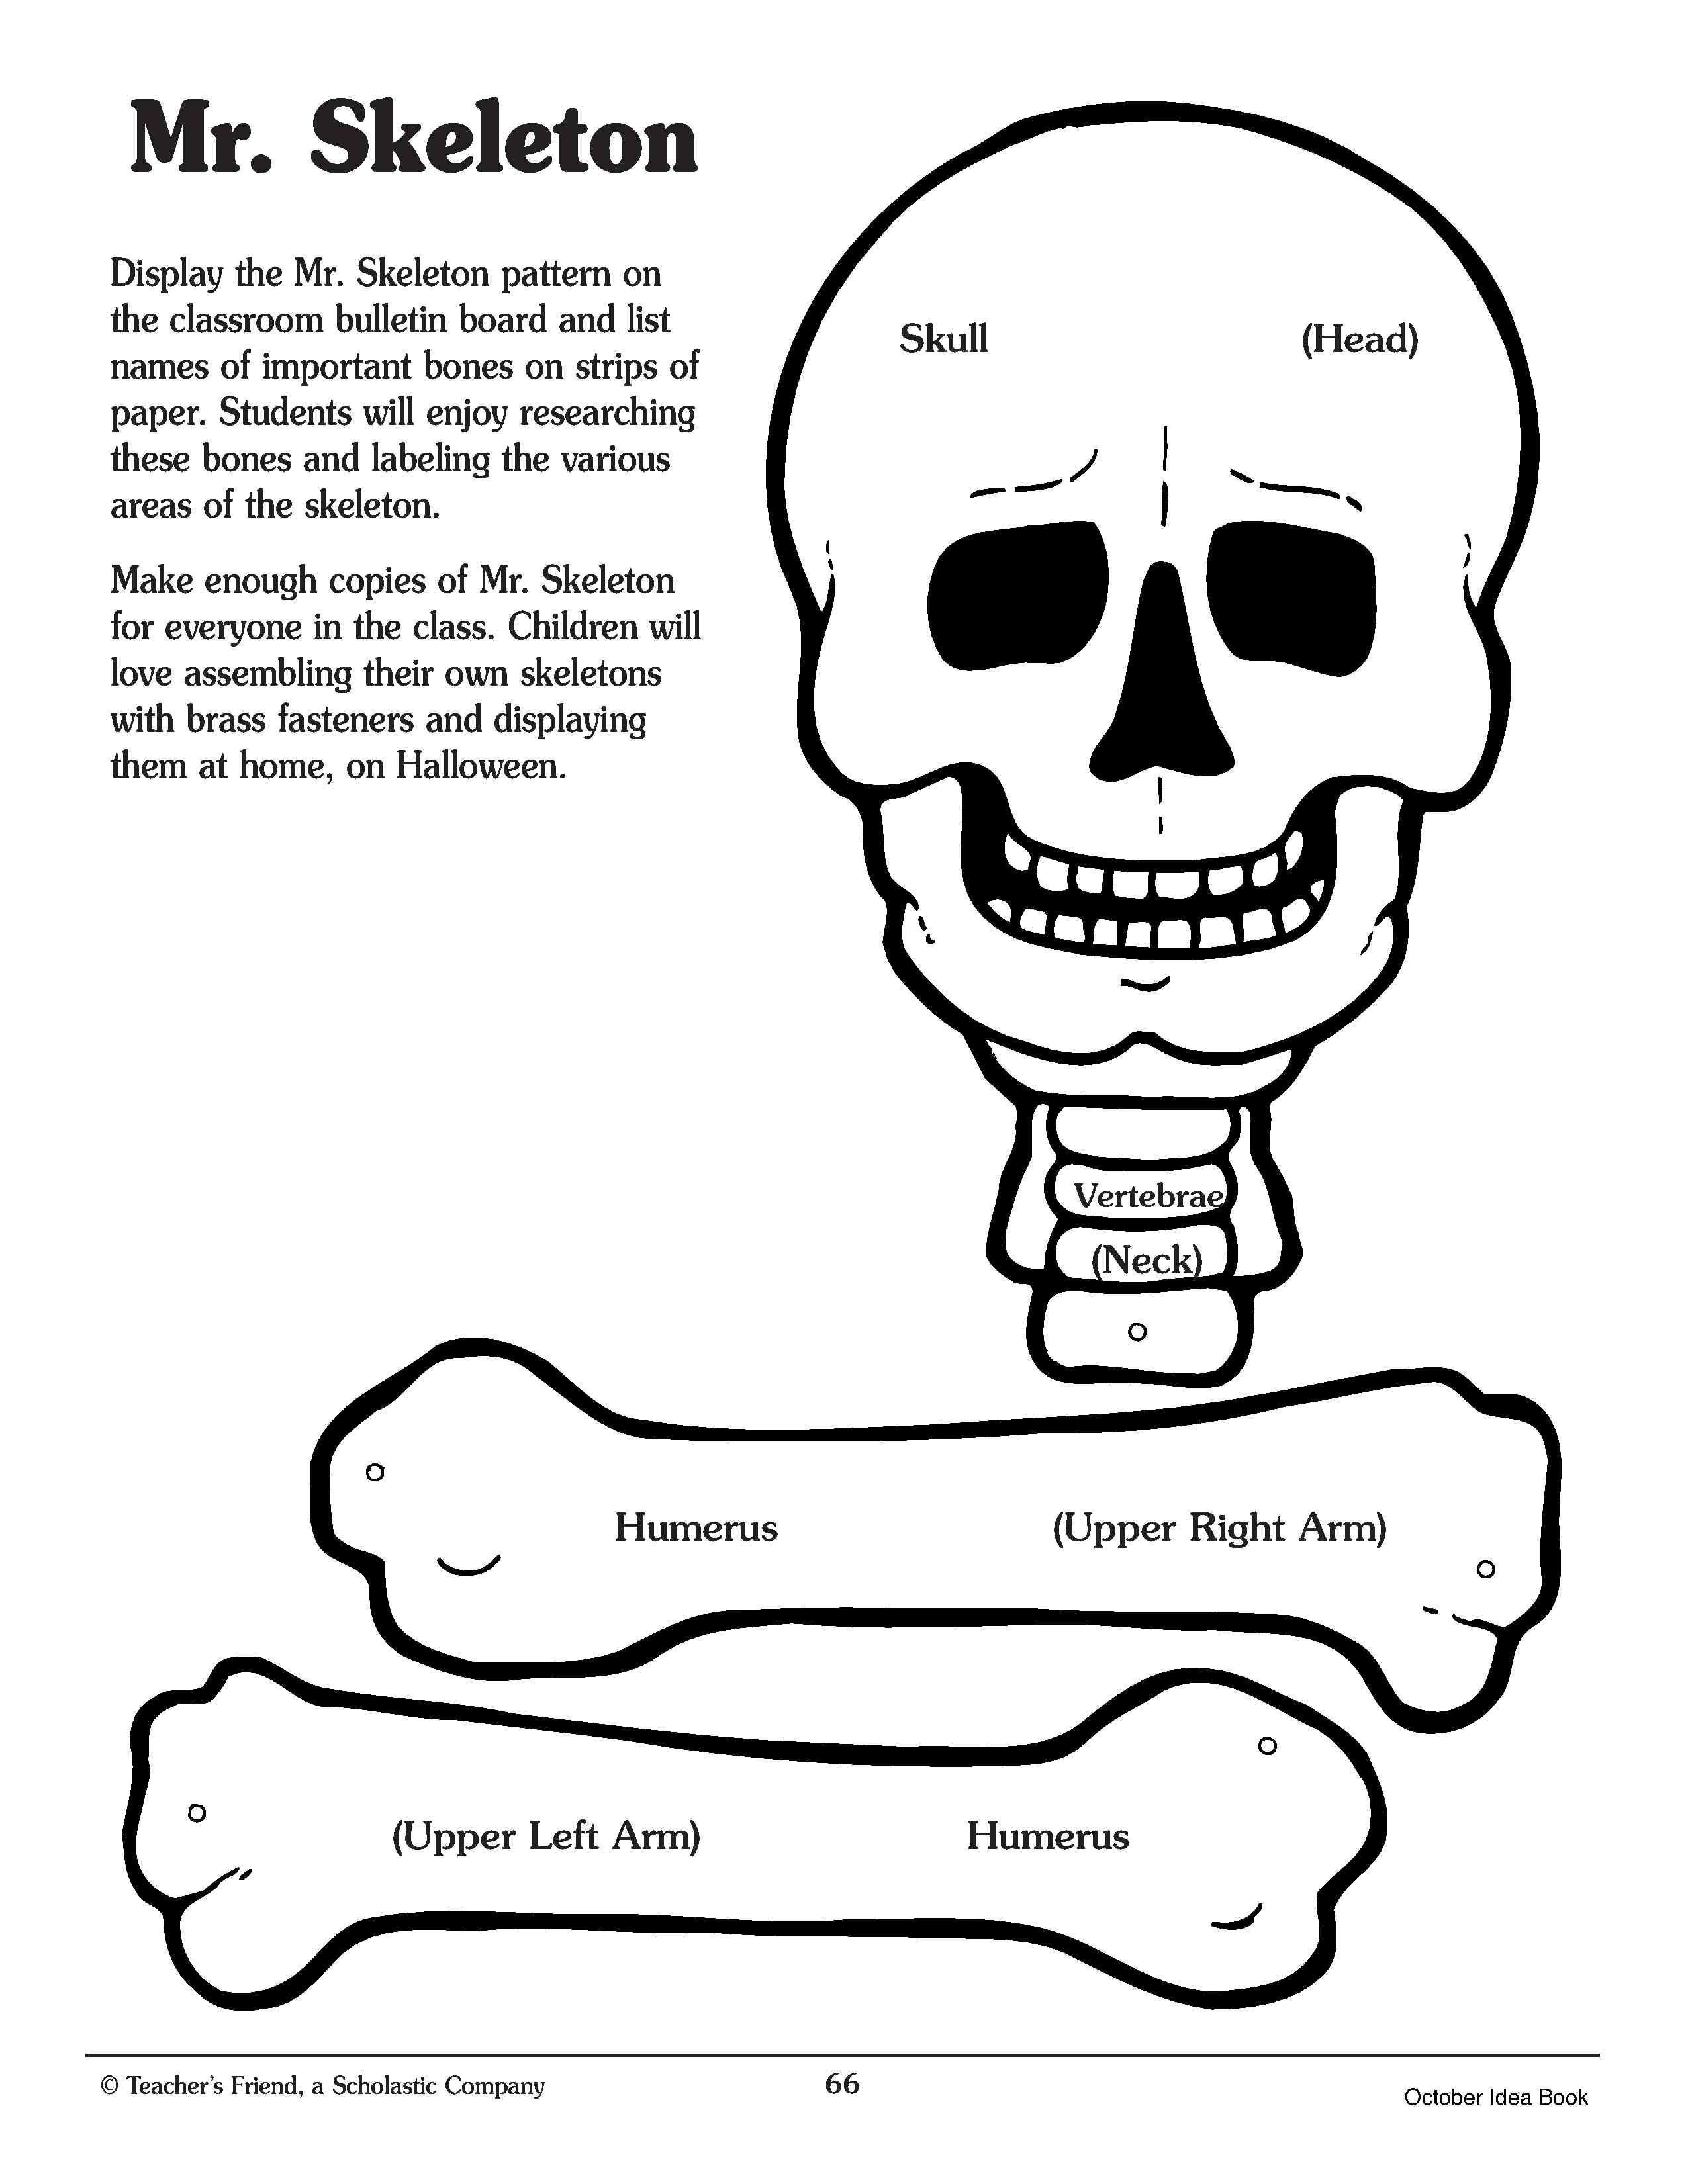 Free Scholastic Cliparts Download Free Clip Art Free